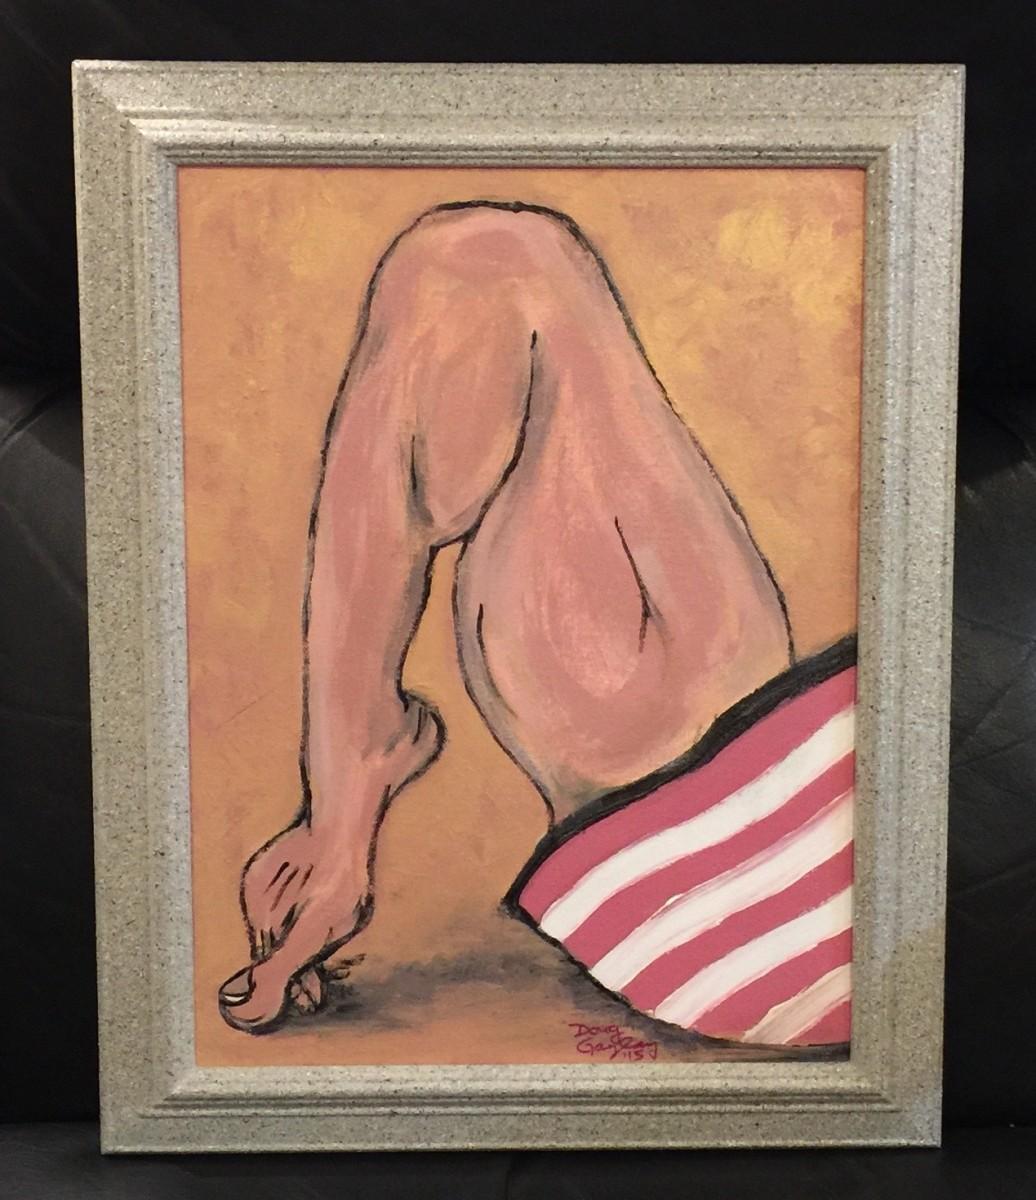 A LEG UP ON YOU by Doug Gazlay